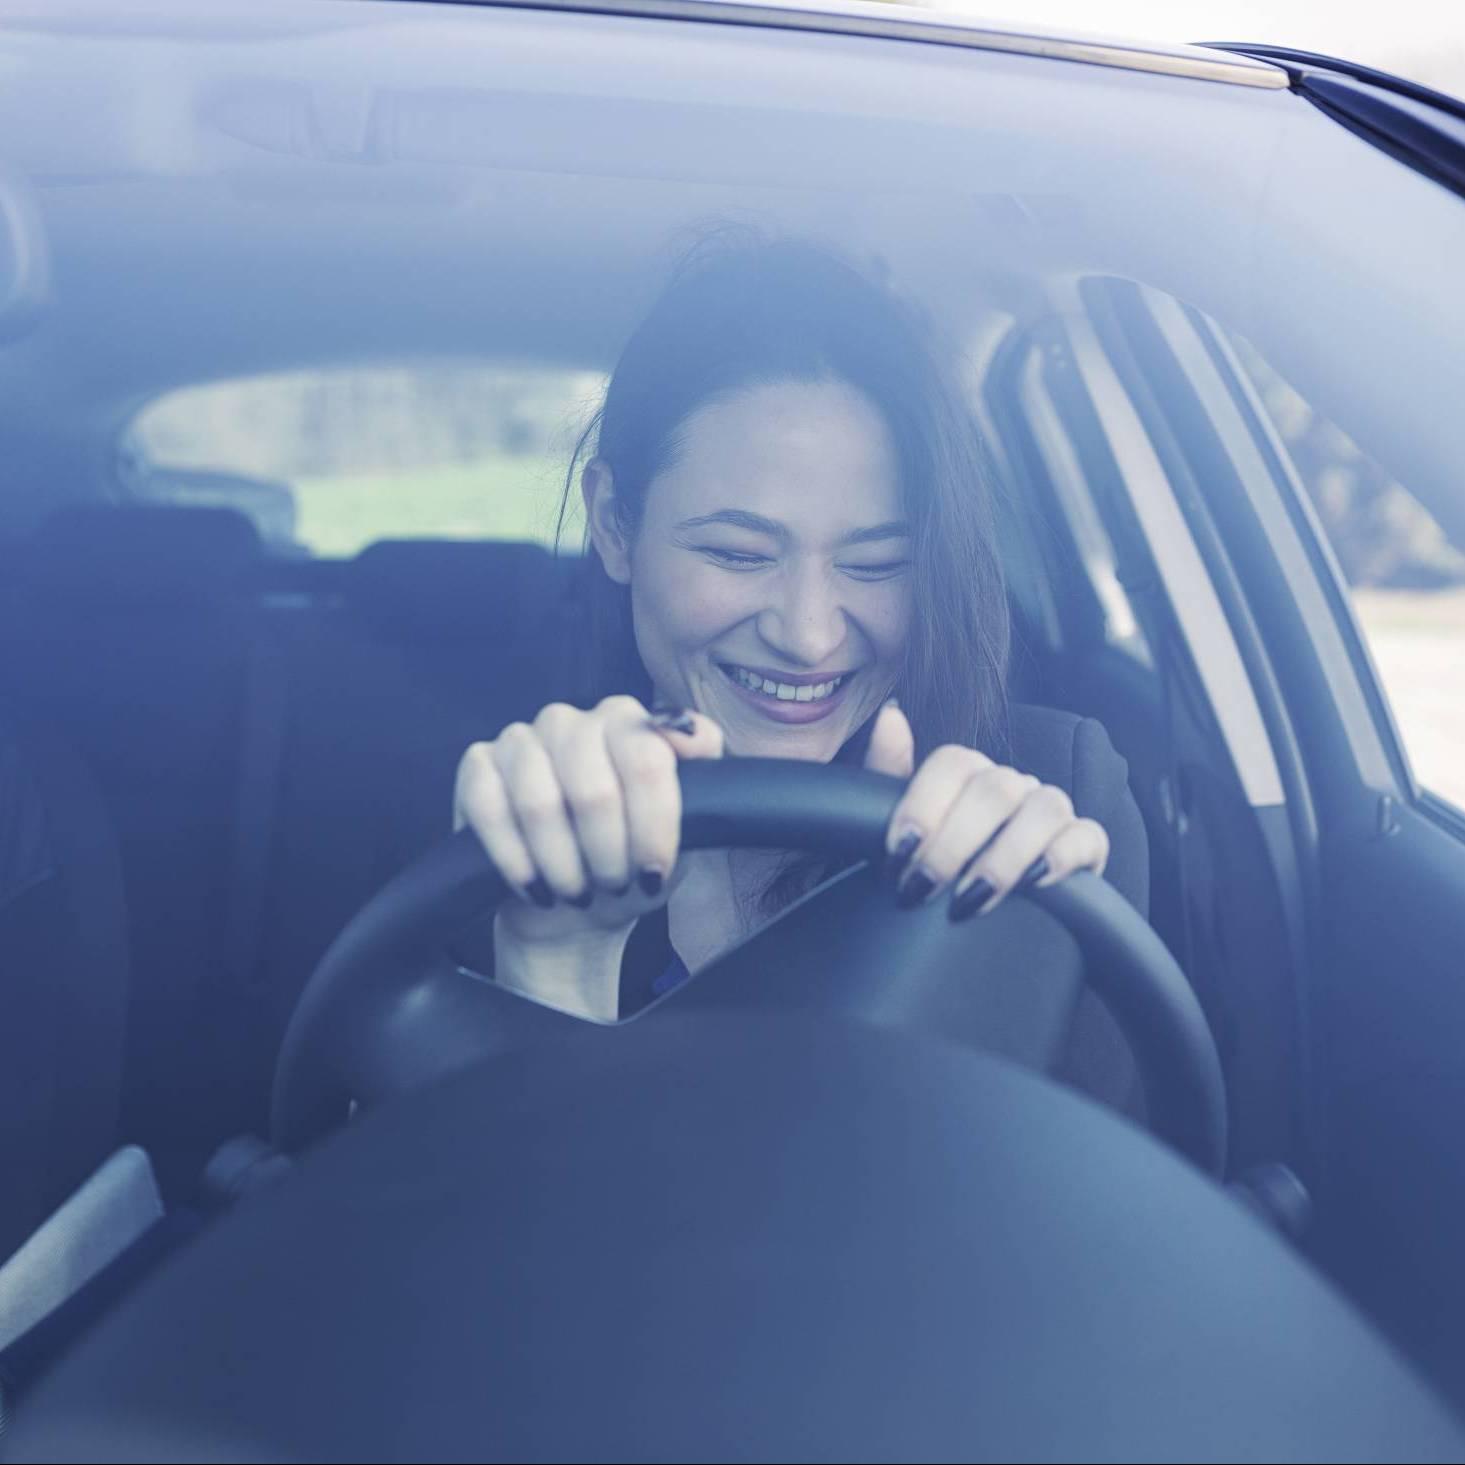 lachende Frau am Steuer eines E-Autos, Emotionen, Freude